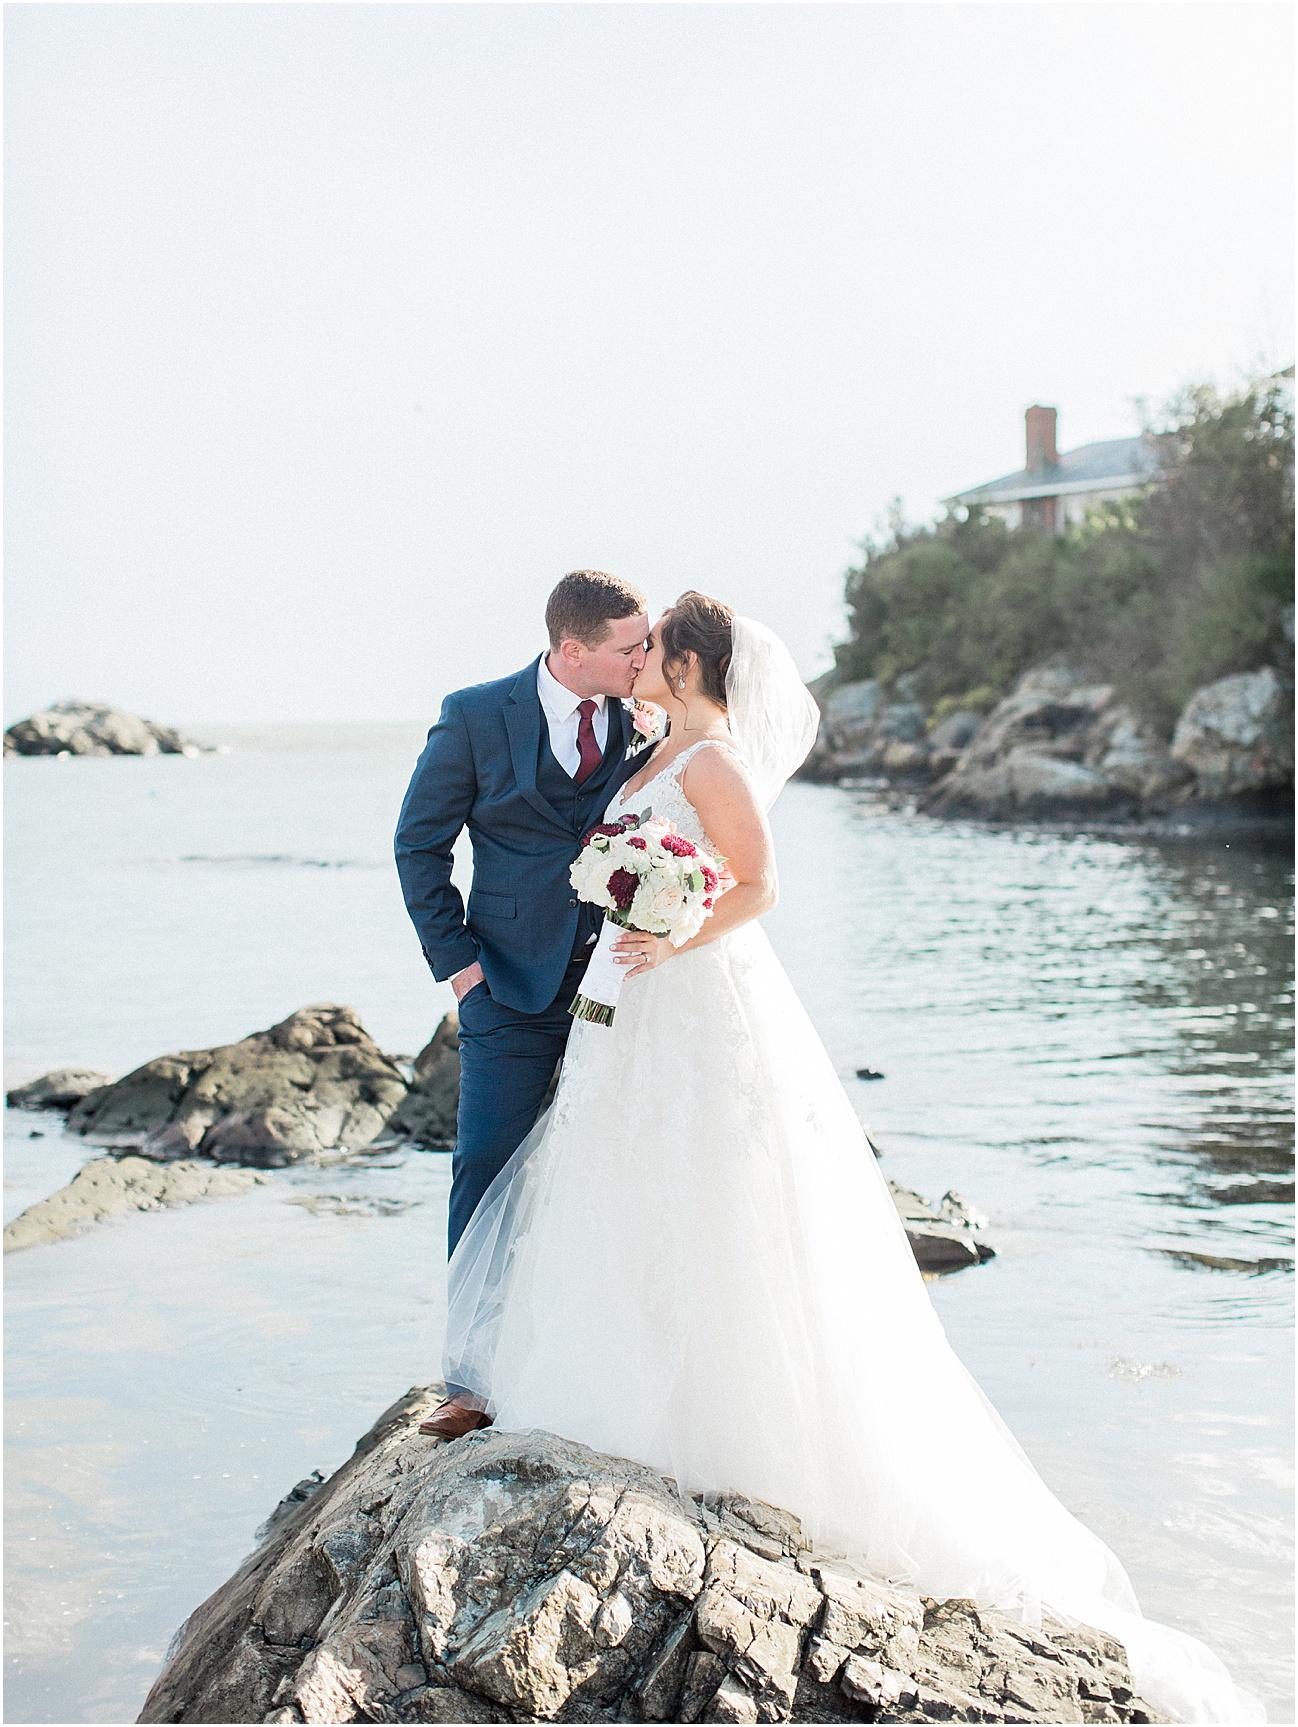 shannon_daniel_dan_atlantic_resort_saint_marys_st_mary_church_fall_newport_catholic_irish_cape_cod_boston_wedding_photographer_meredith_jane_photography_photo_1626.jpg